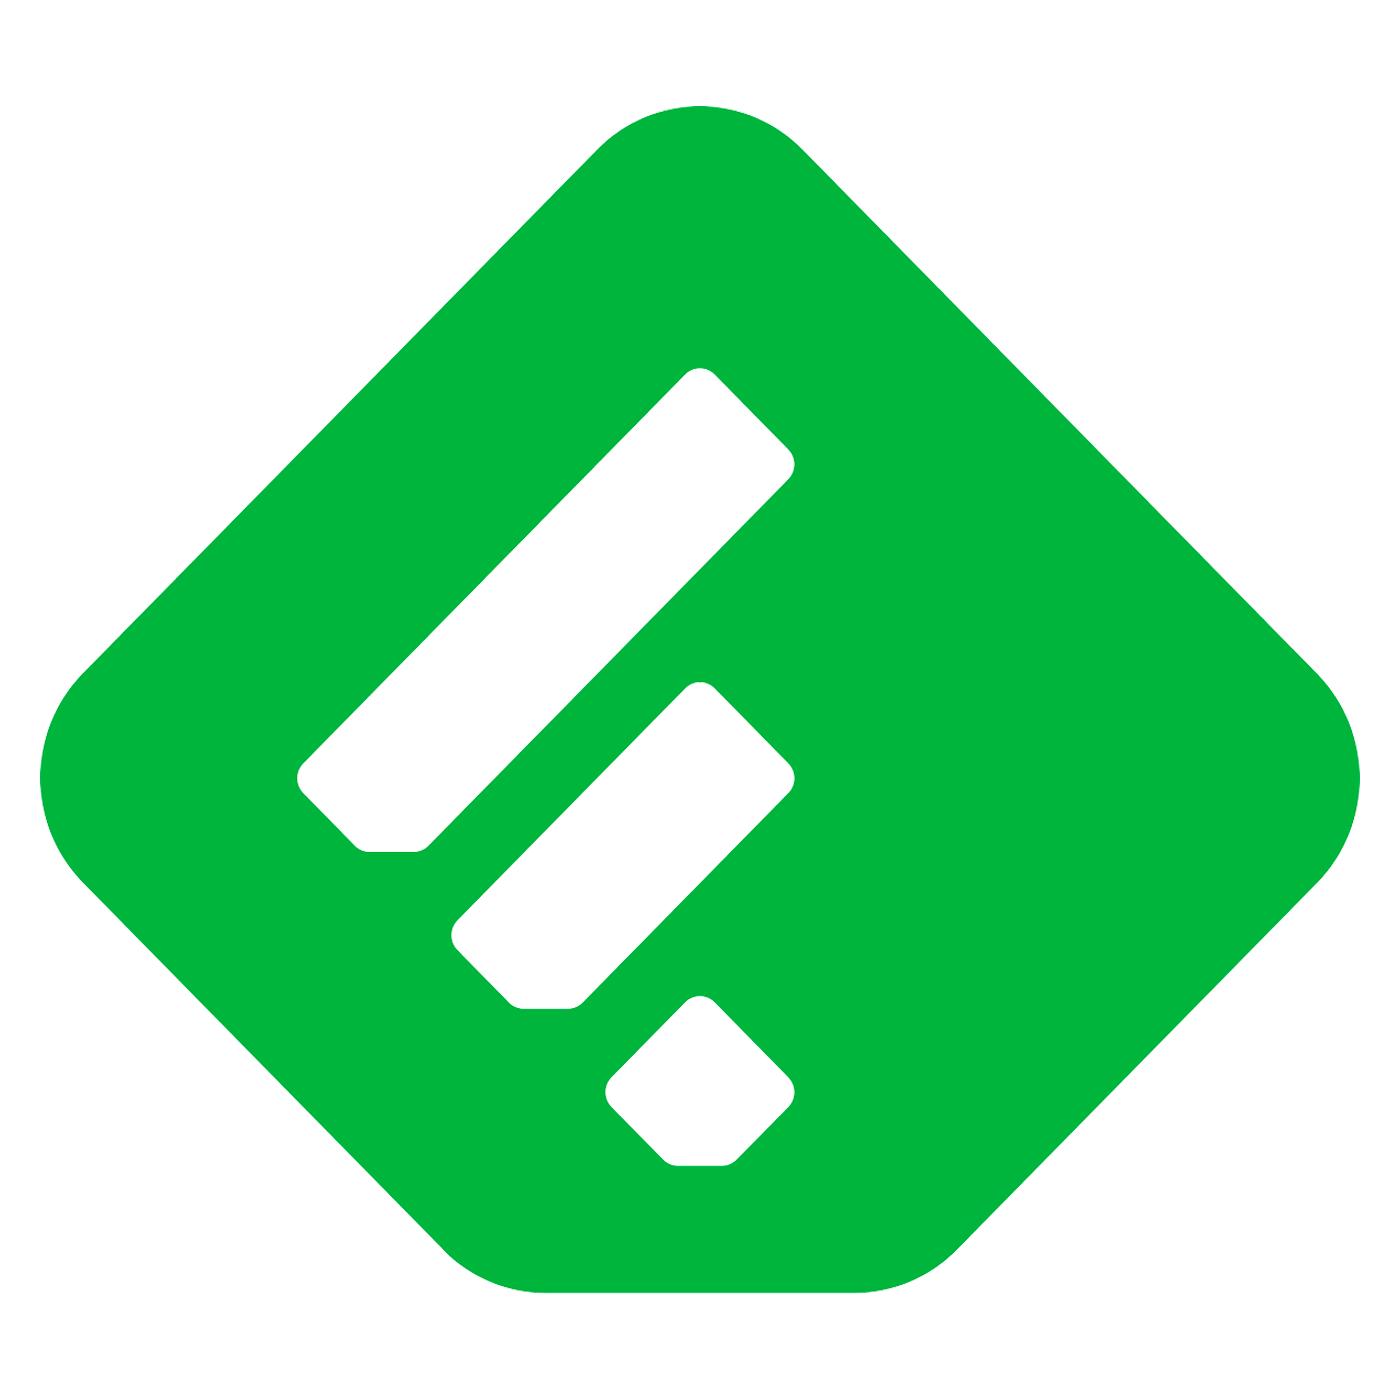 The Feedly Logo